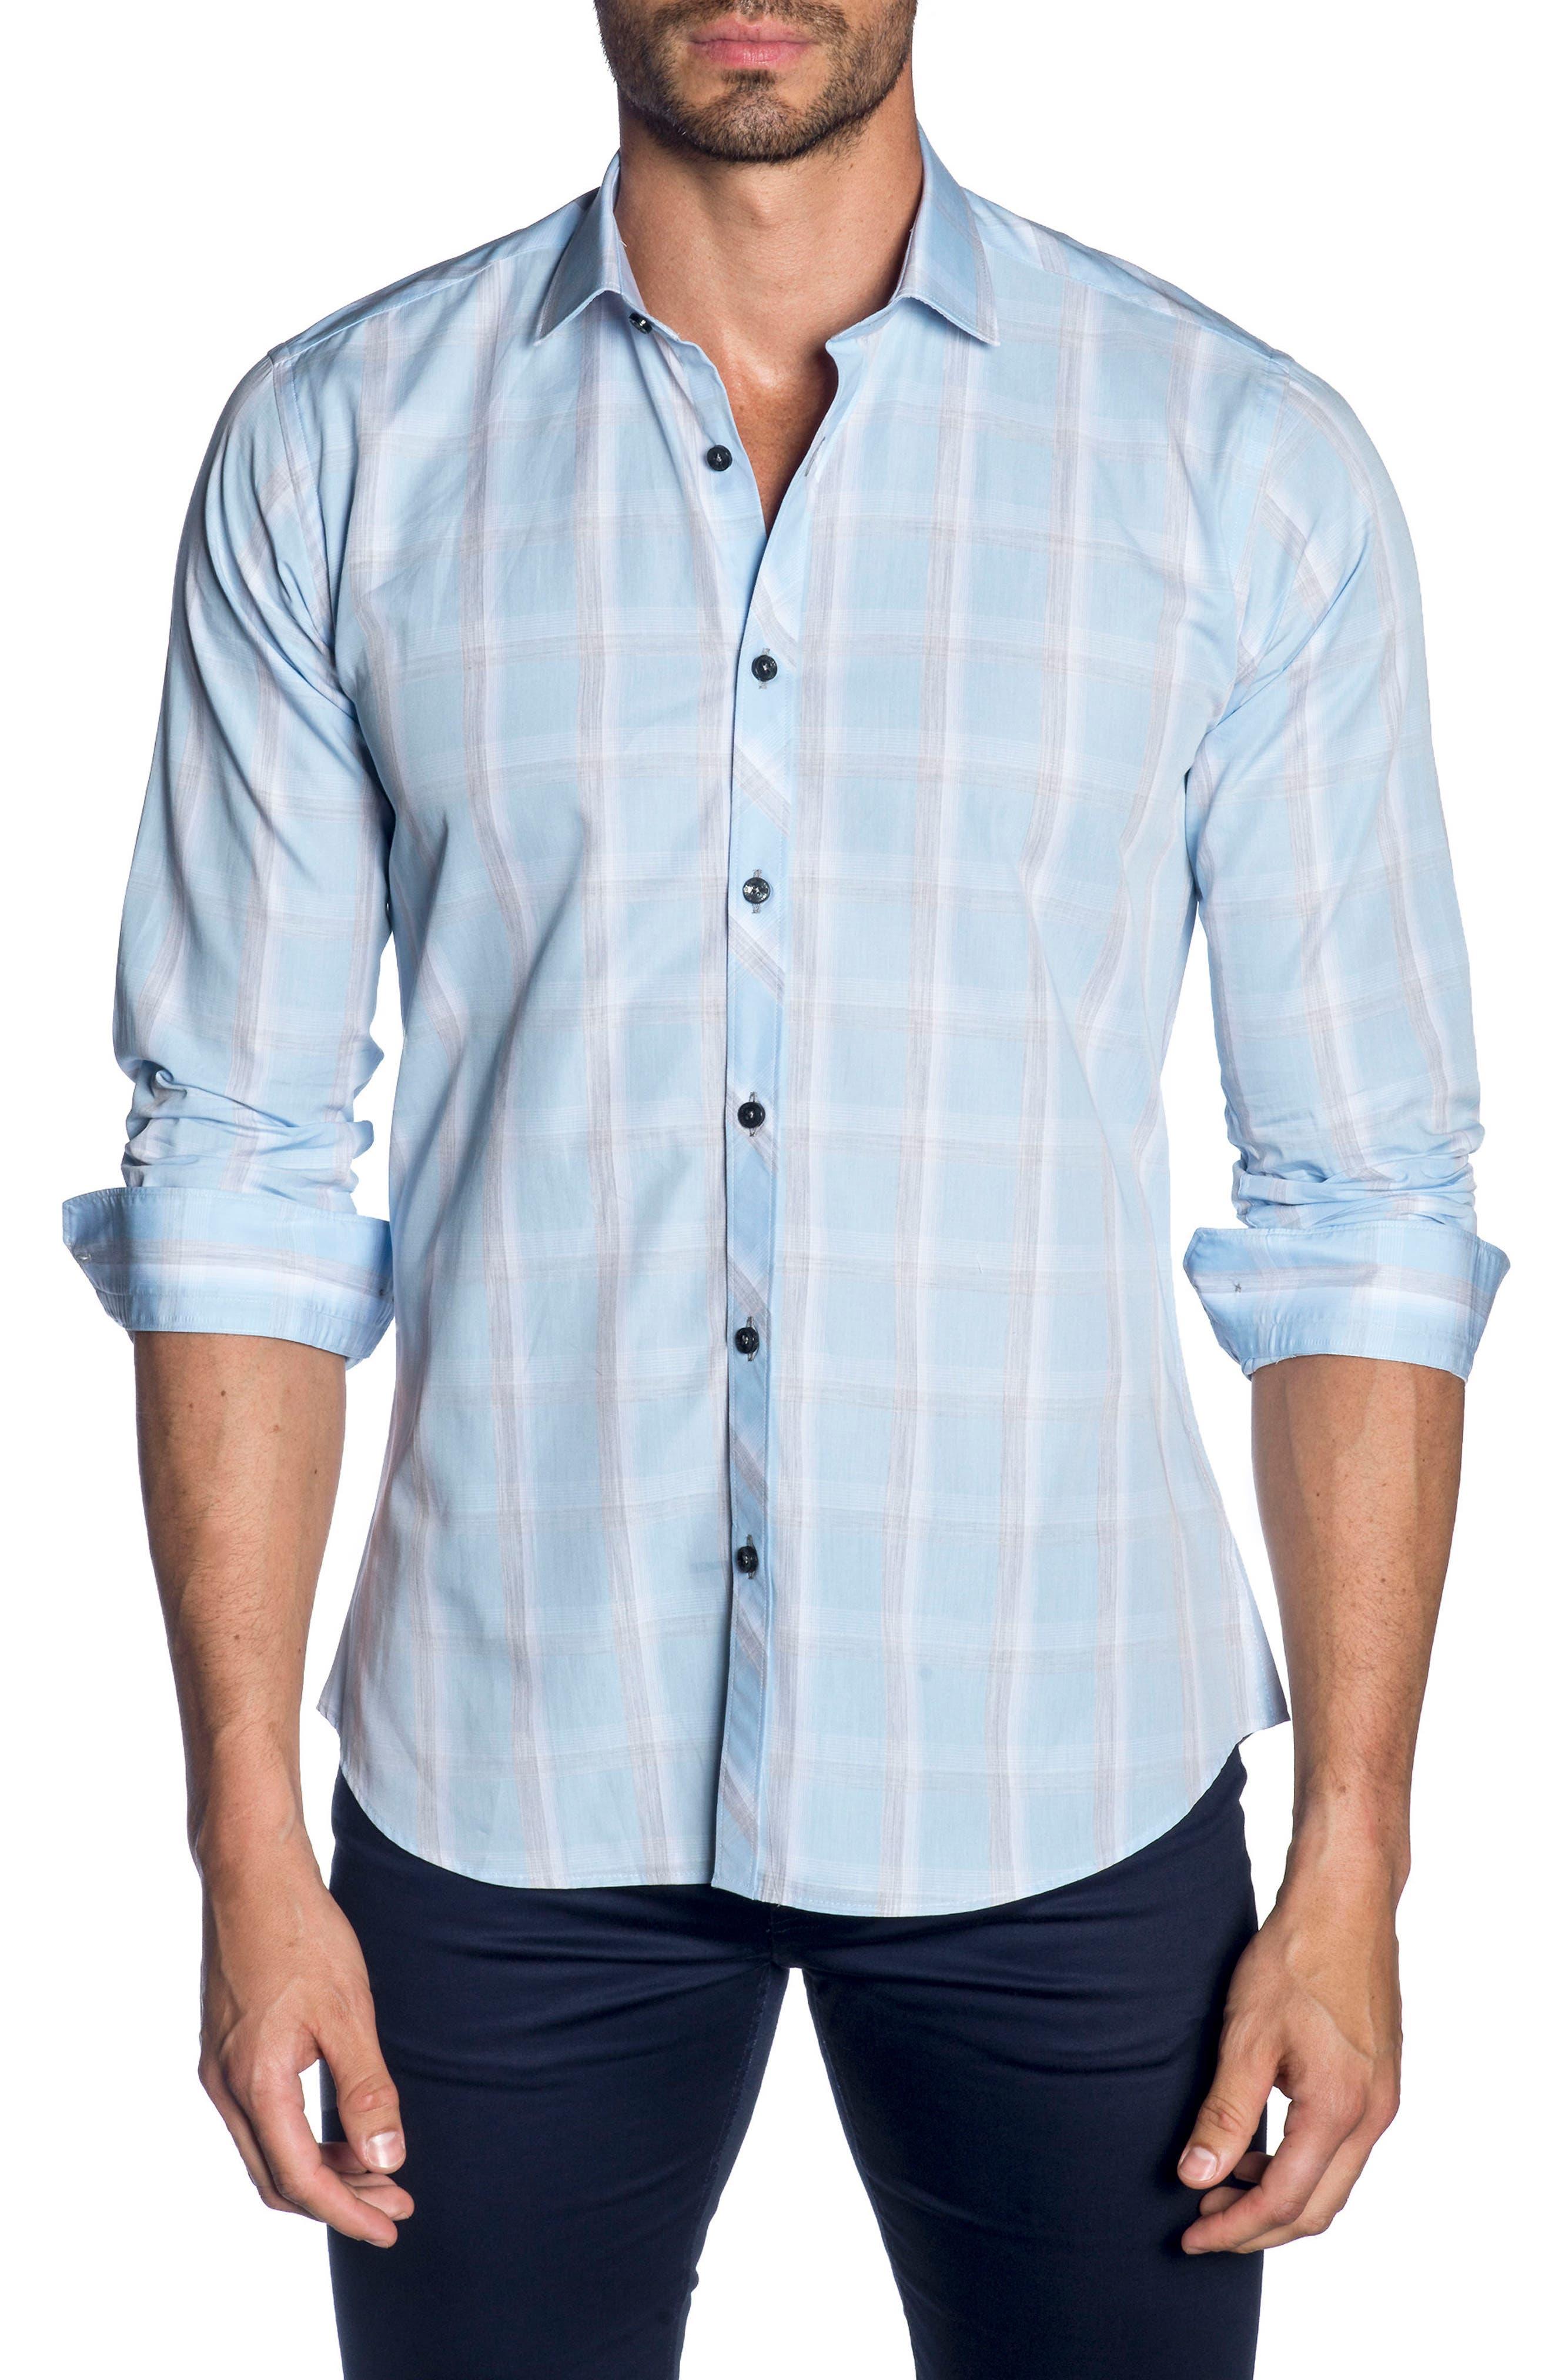 Trim Fit Sport Shirt,                             Main thumbnail 1, color,                             SKY BLUE GREY CHECK